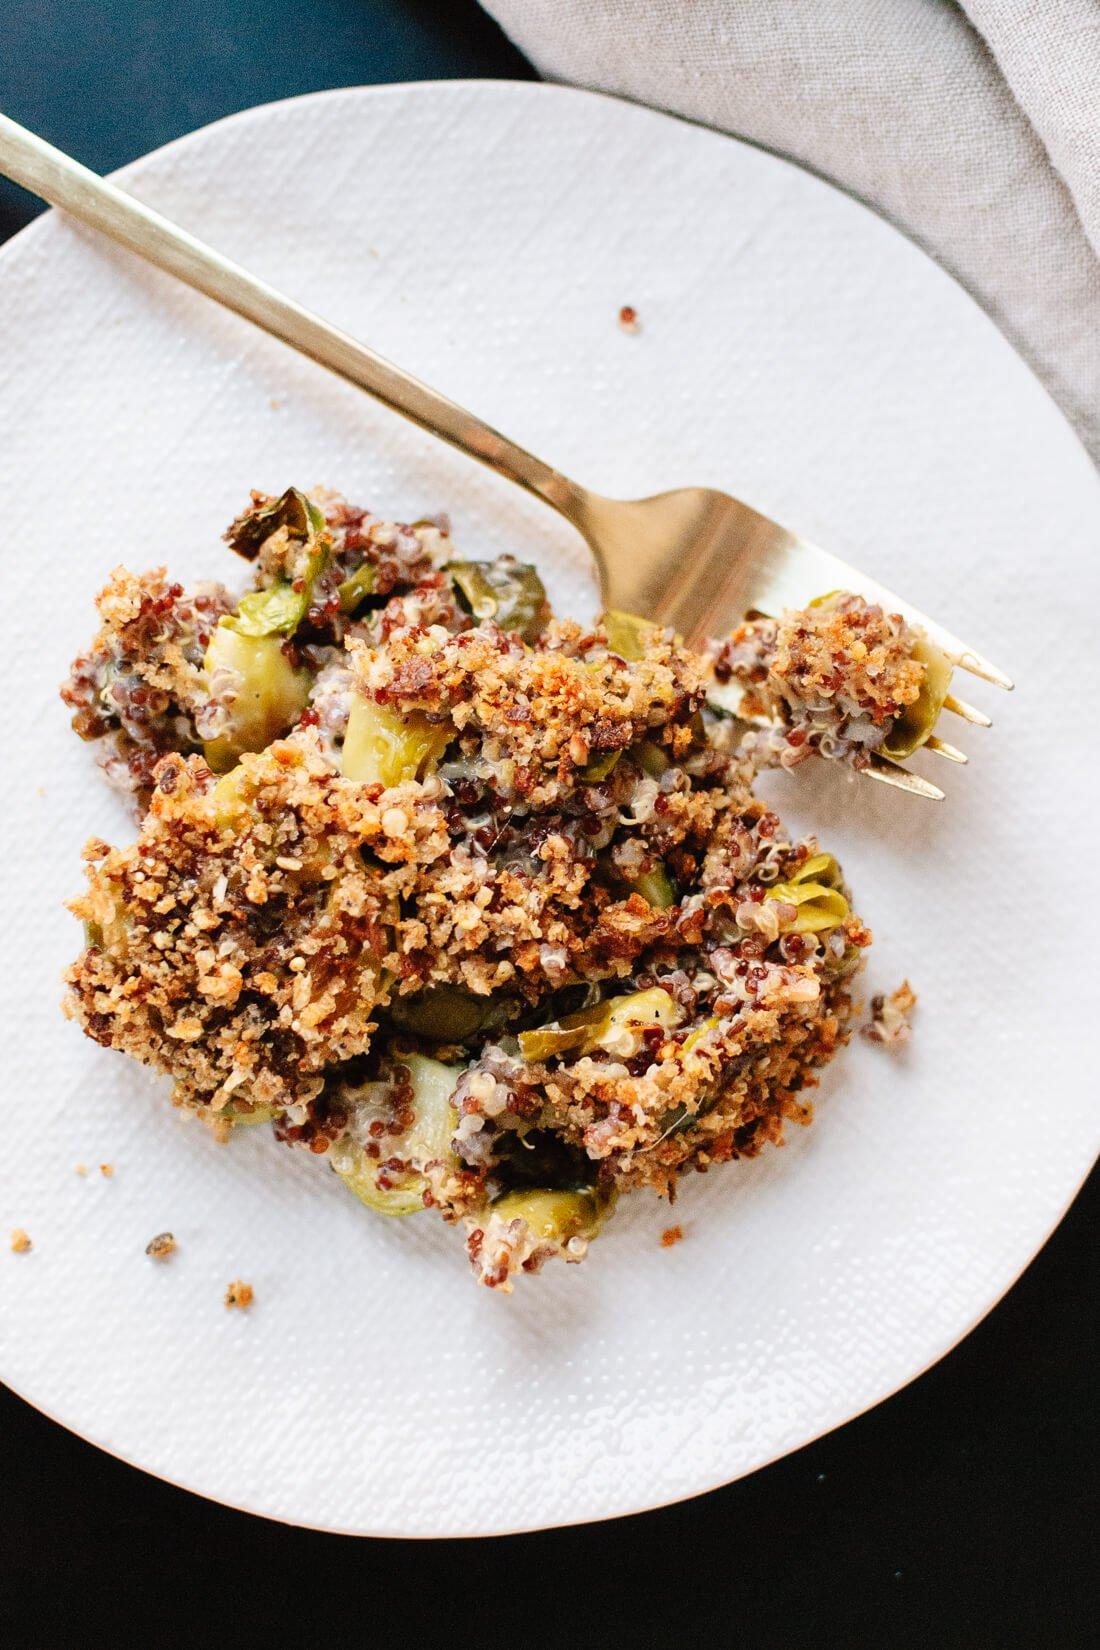 Creamy Brussels sprout quinoa gratin recipe